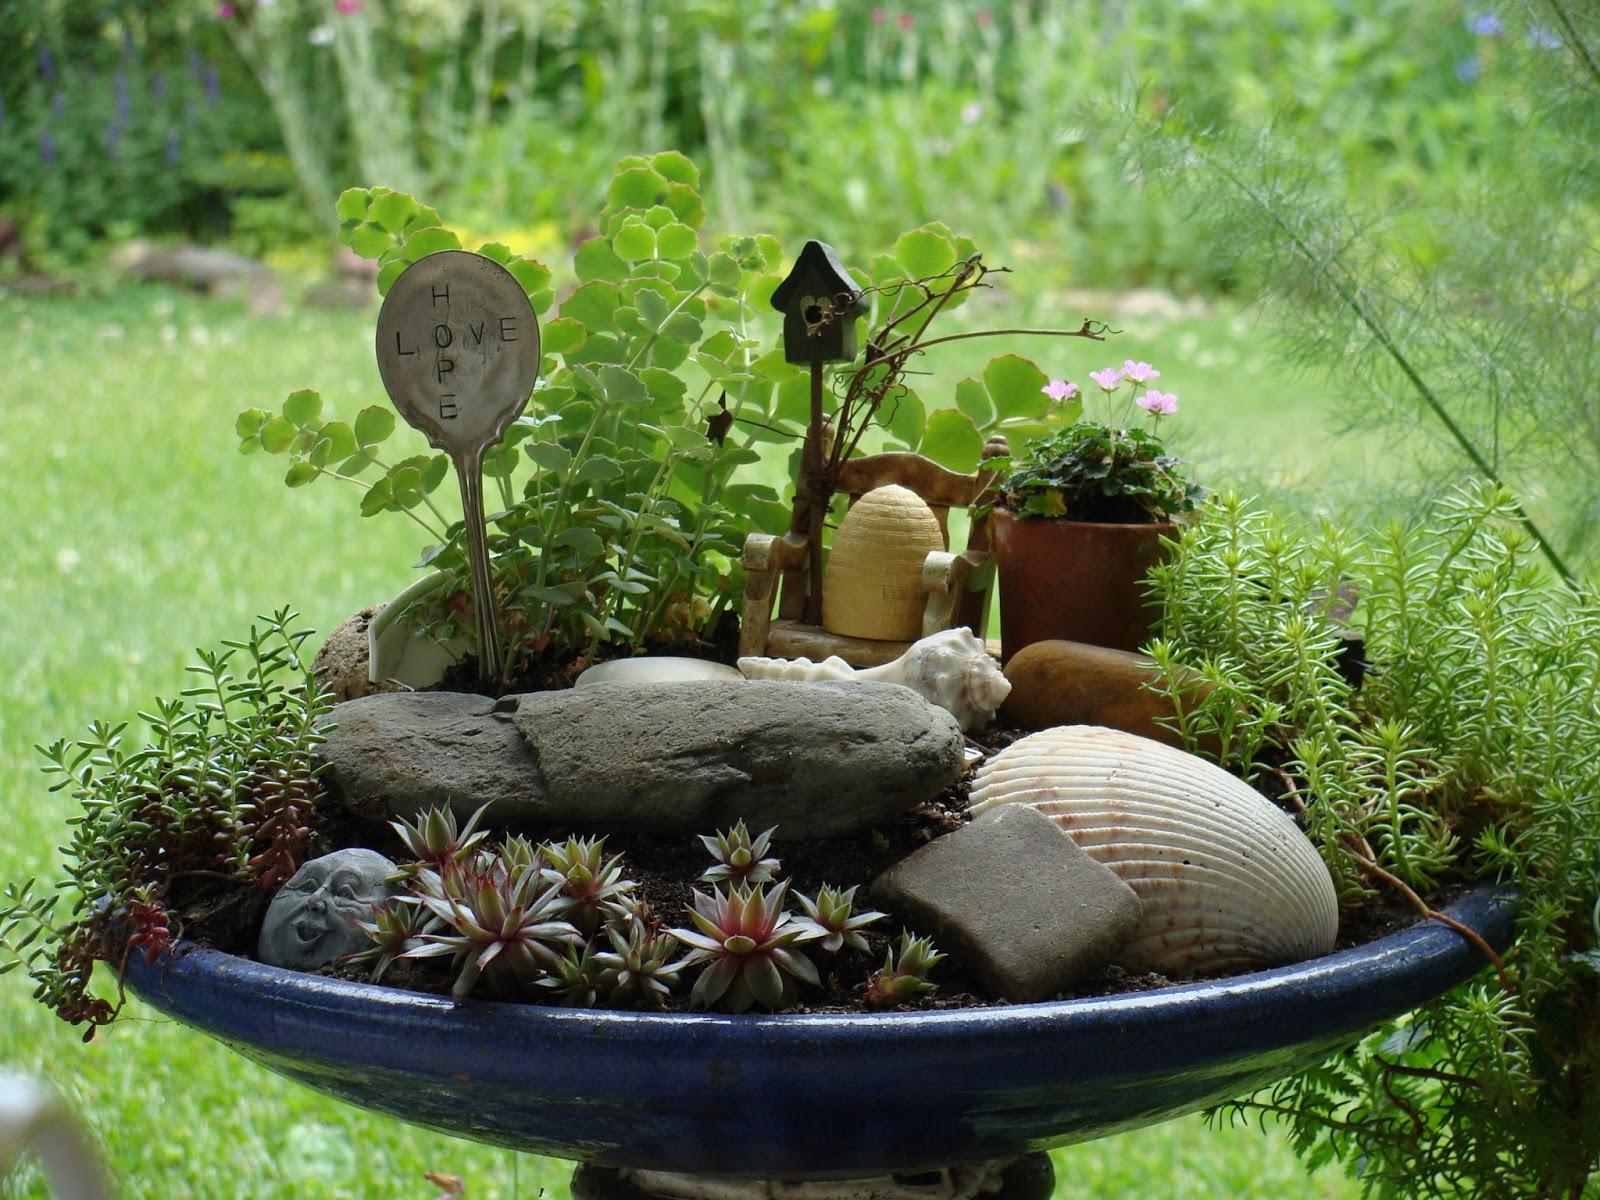 Outdoor Yard Items